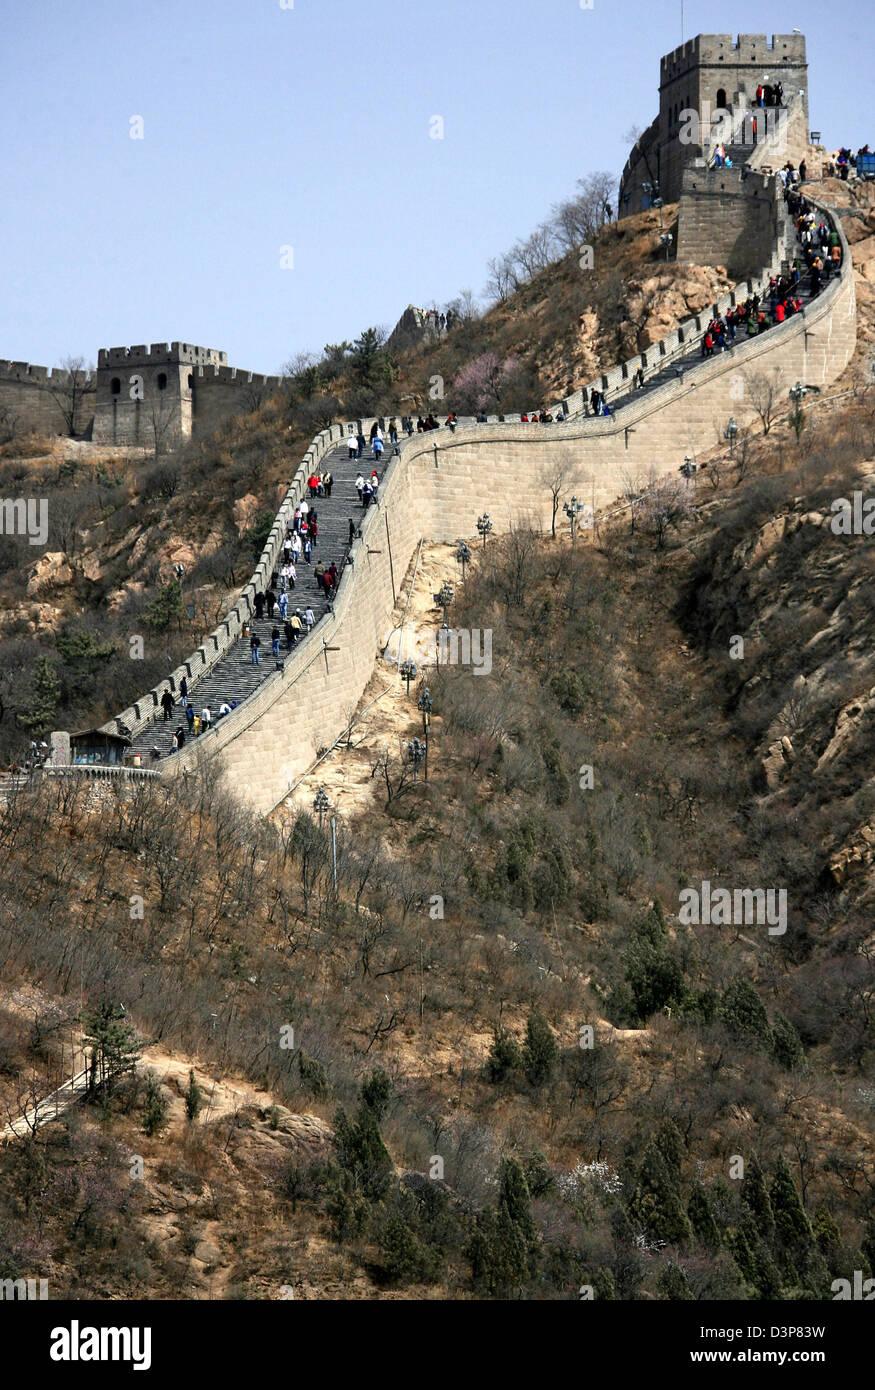 (dpa file) Visitors walk along a renovated part of Great Wall near the capital Beijing, China, Tuesday 11 April - Stock Image